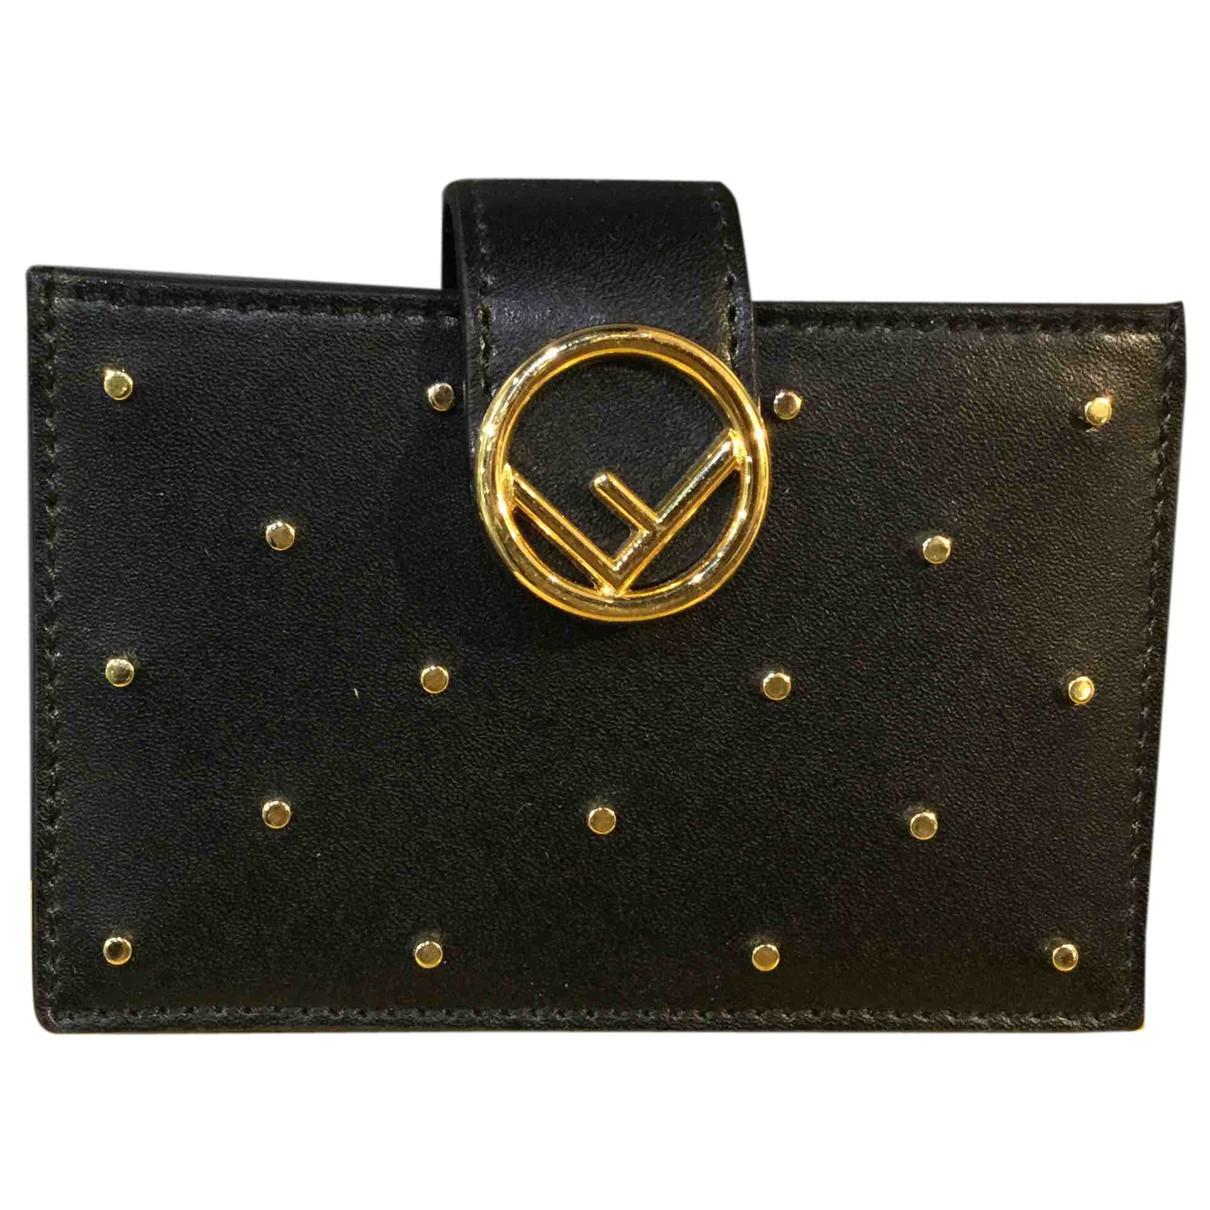 Fendi N Black Leather Purses, wallet & cases for Women N